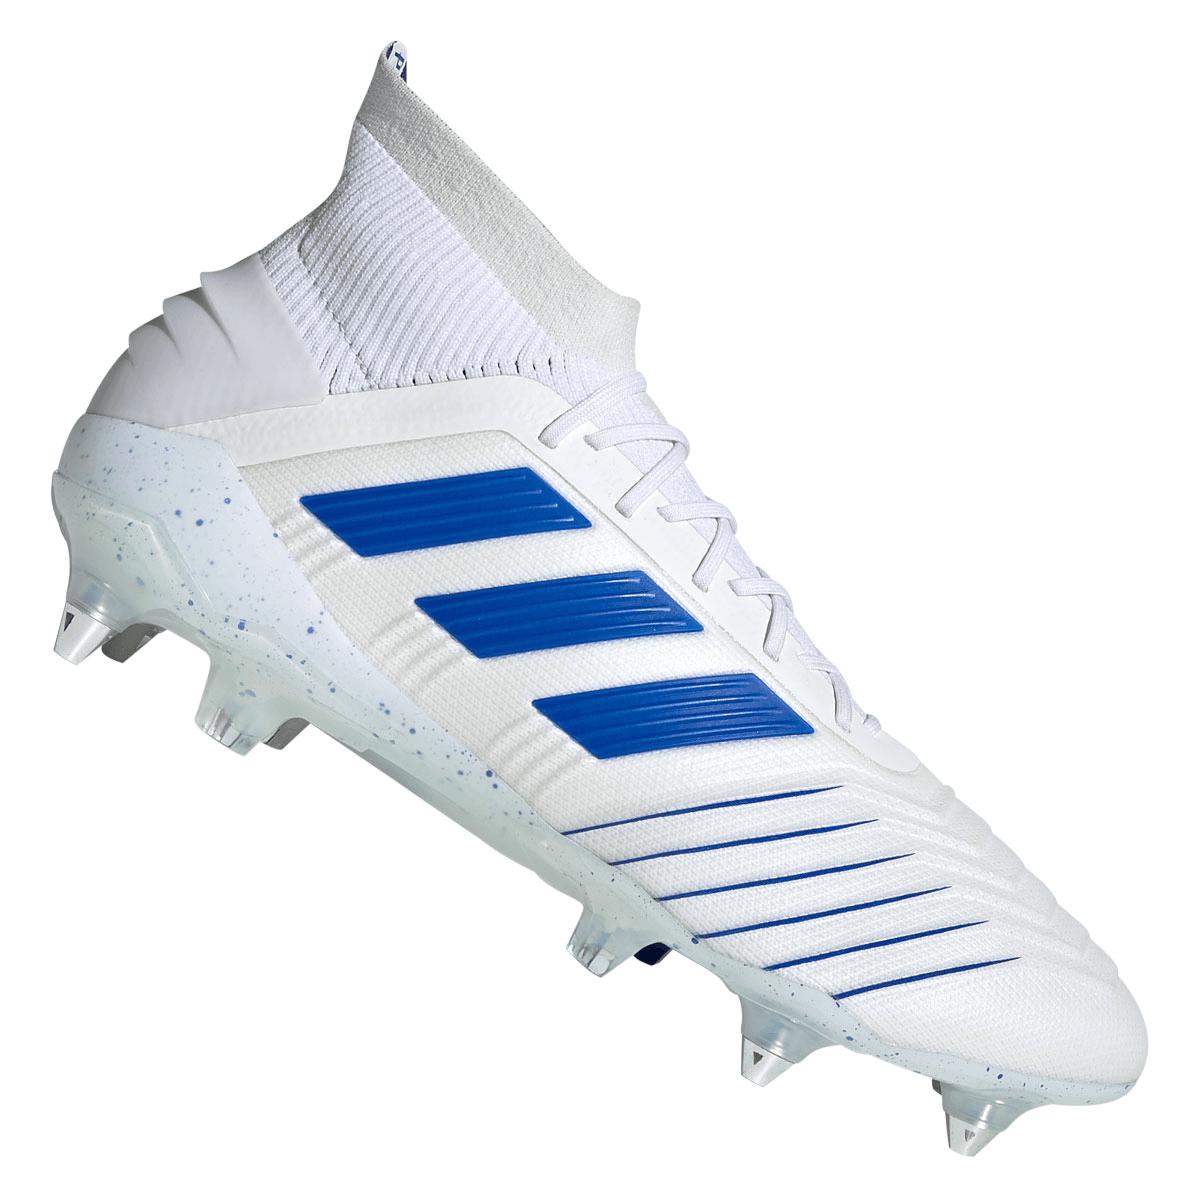 adidas Fußballschuh Predator 19.1 SG weißblau